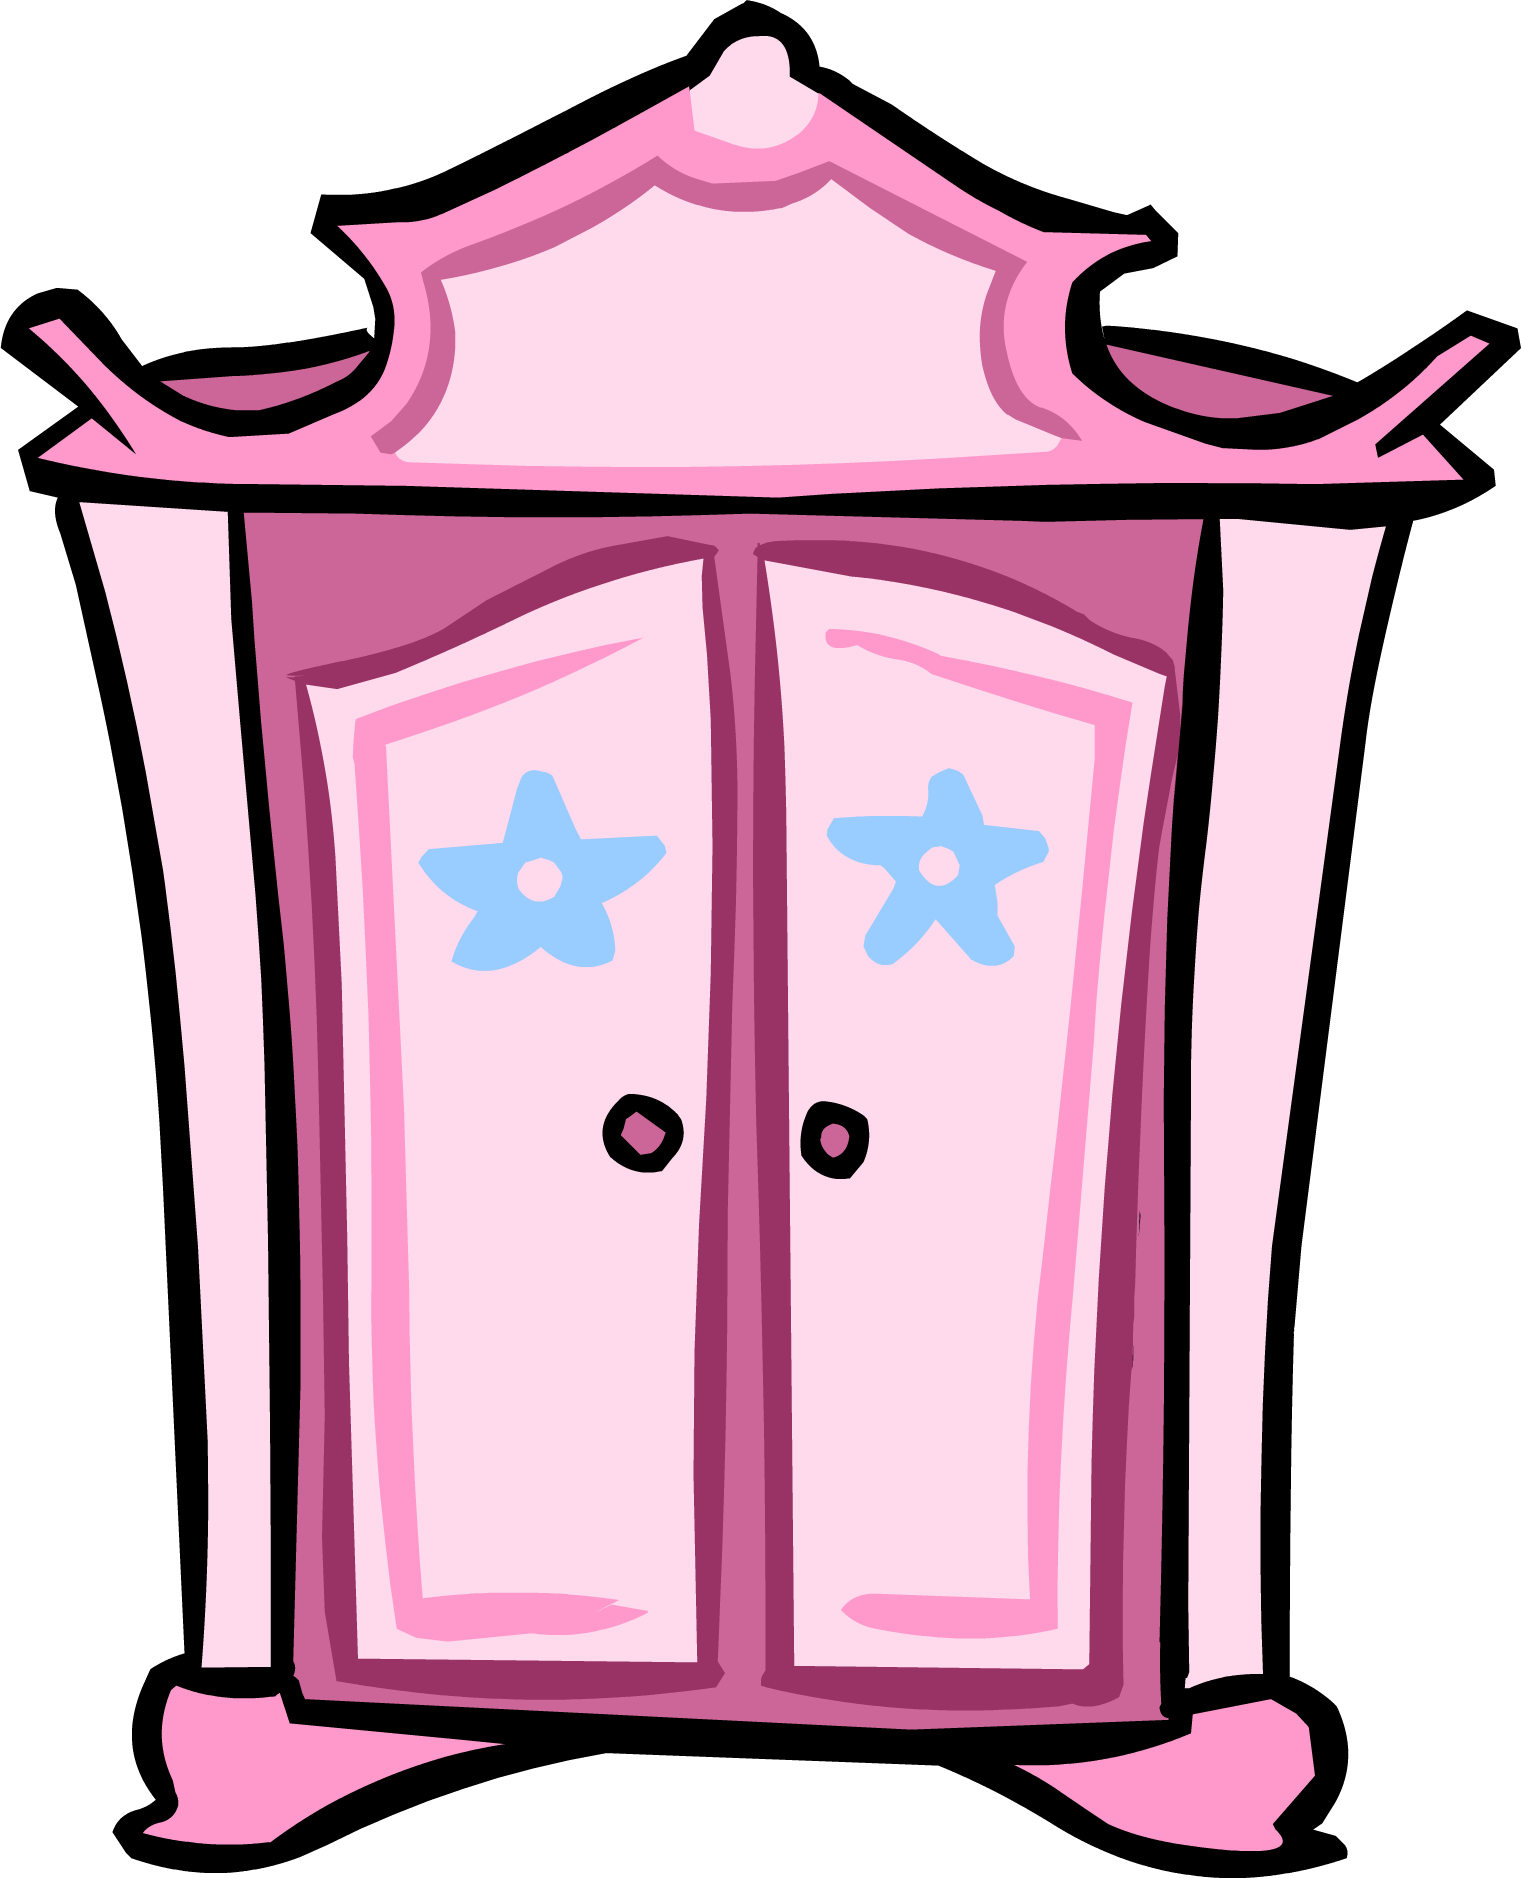 princess armoire club penguin wiki fandom powered by wikia. Black Bedroom Furniture Sets. Home Design Ideas